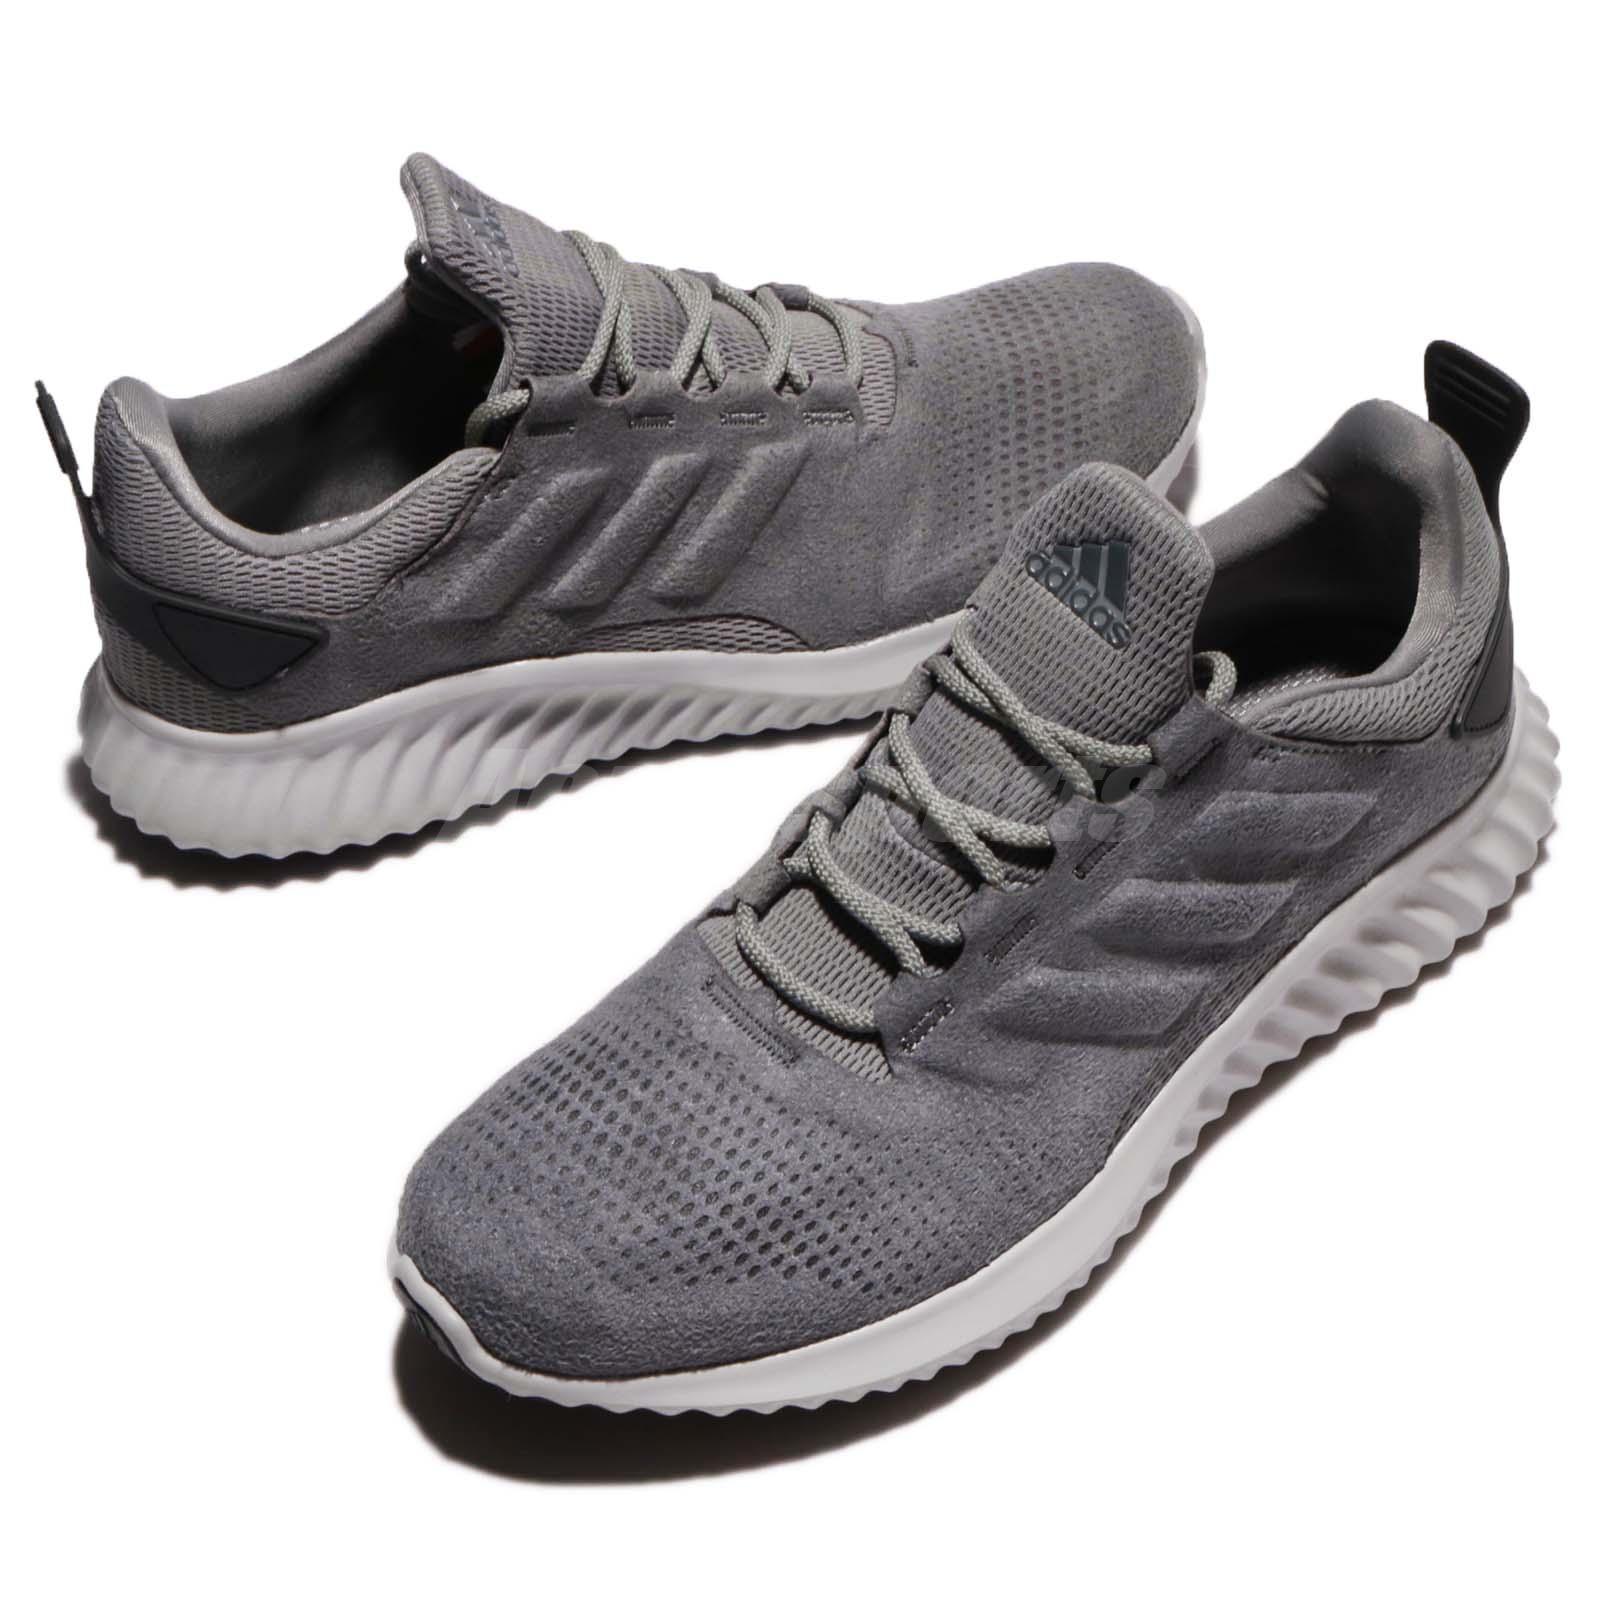 0ad7eeb482096 adidas Alphabounce CR M Grey Black Men Running Training Shoes ...